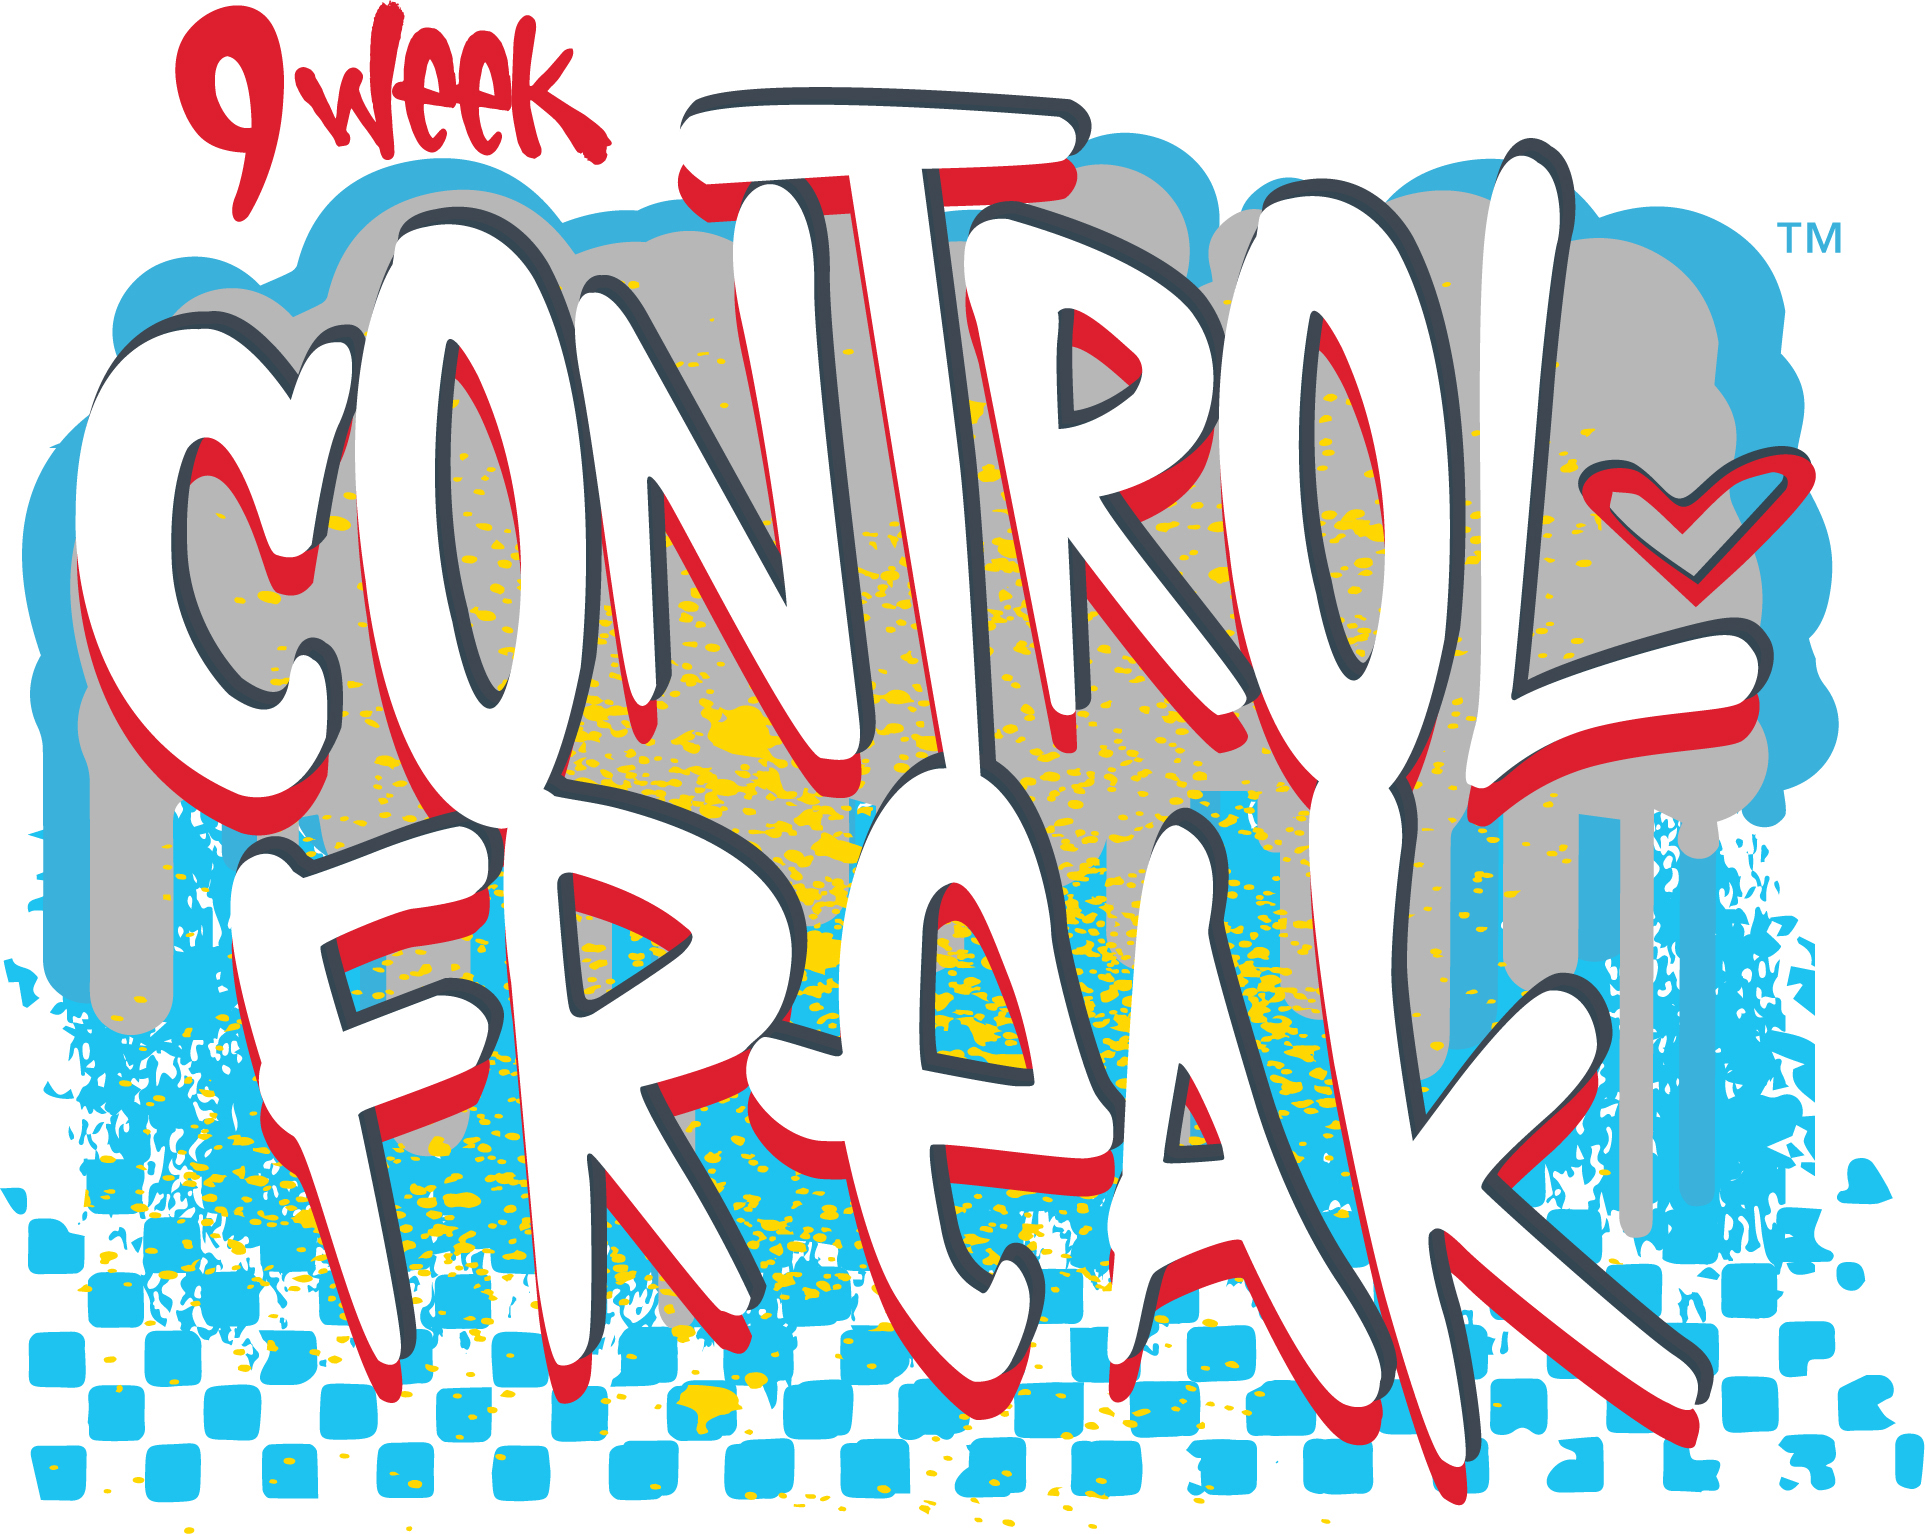 9 week control freak